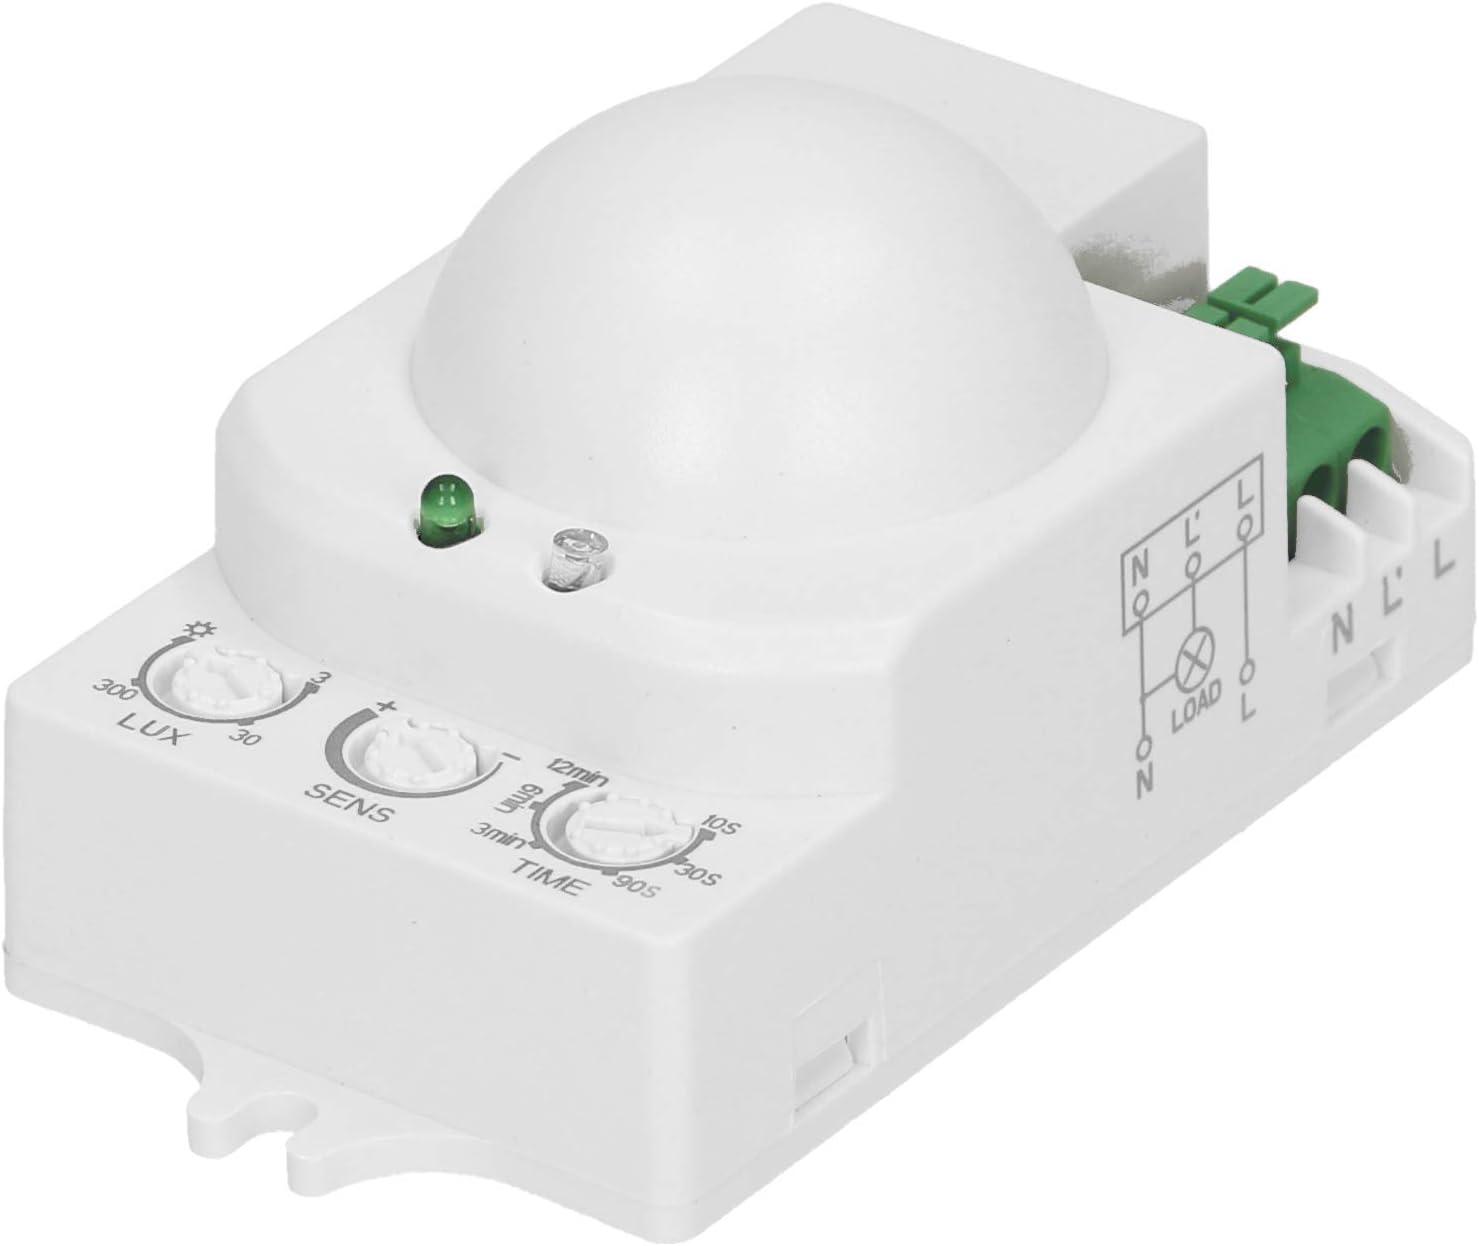 ORNO OR- CR-208 Mini de microondas Sensor de Movimiento 360 grados internos con sensor crepuscular LED Compatible